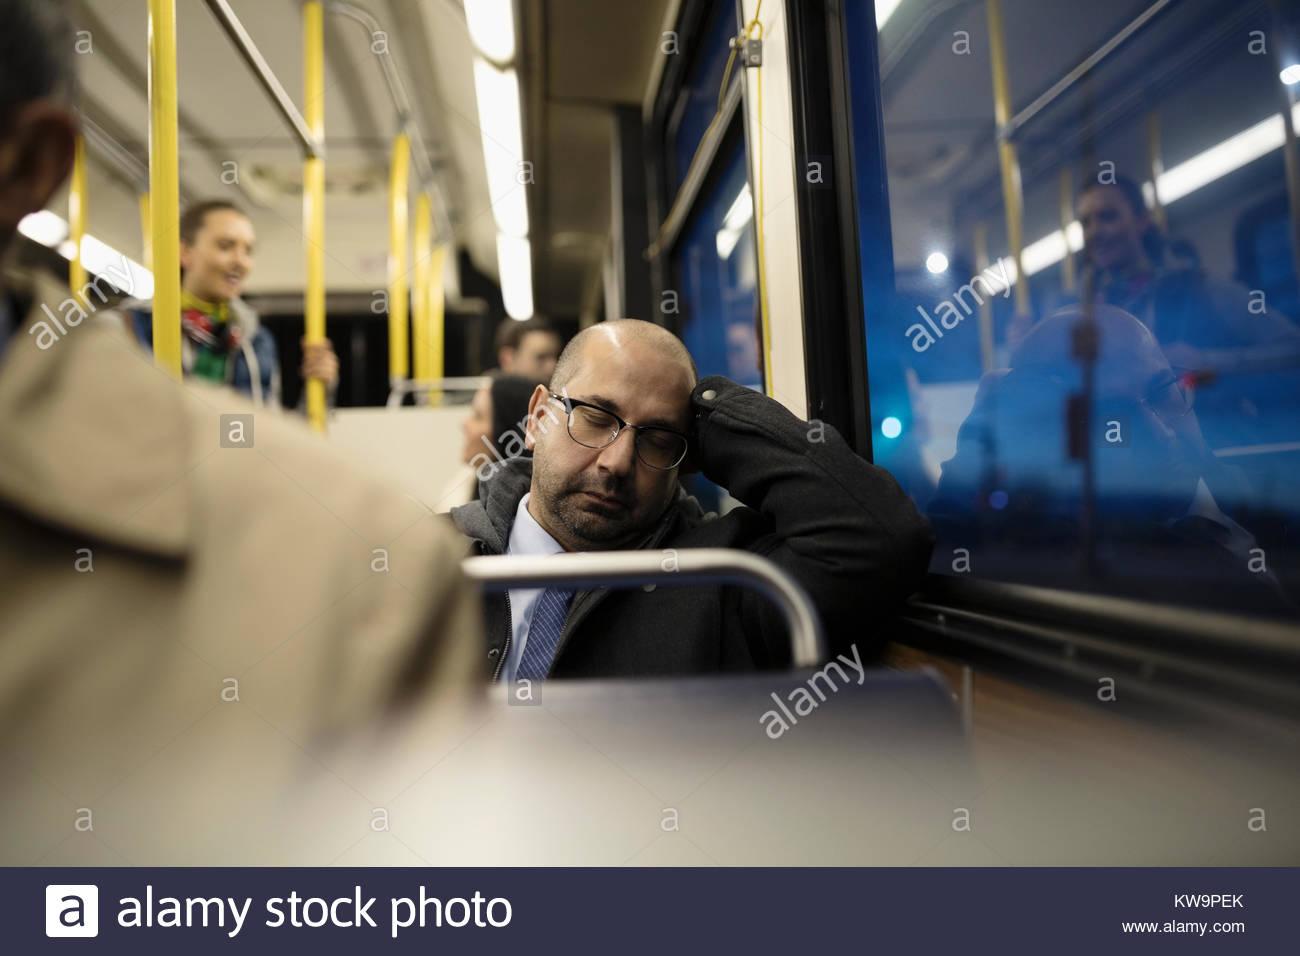 Fatigué de banlieue mature businessman sleeping on bus Photo Stock